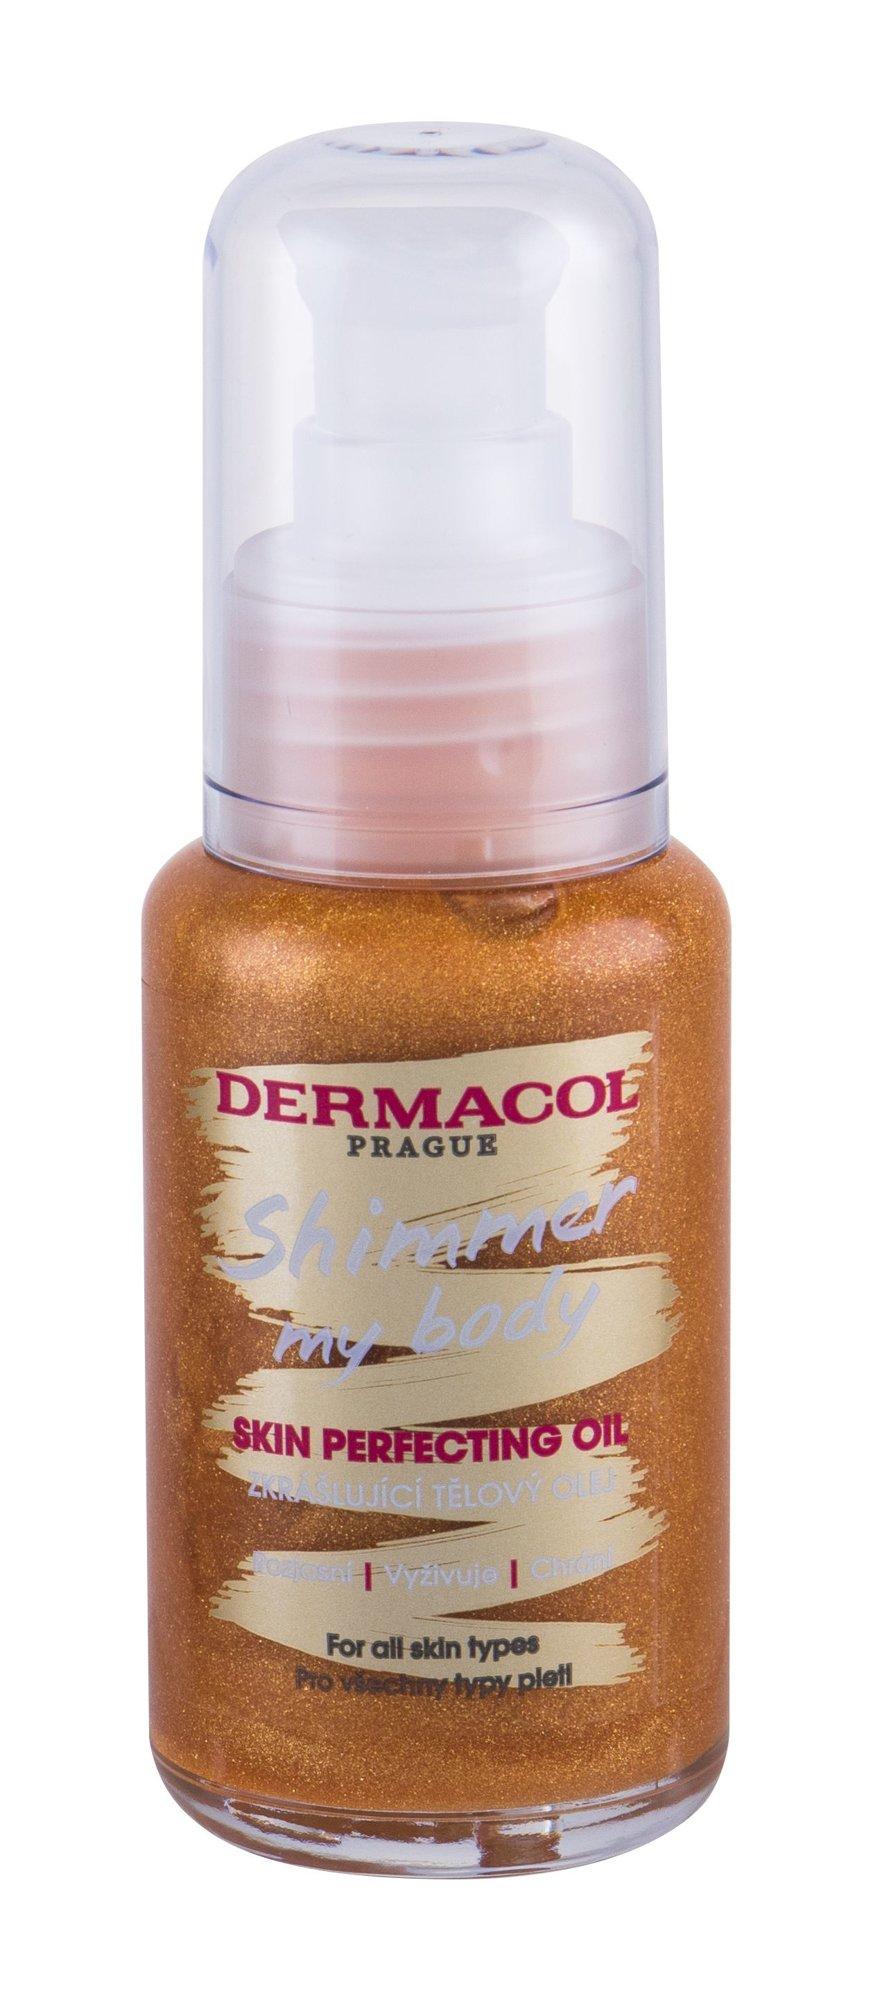 Dermacol Shimmer My Body Body Oil 50ml